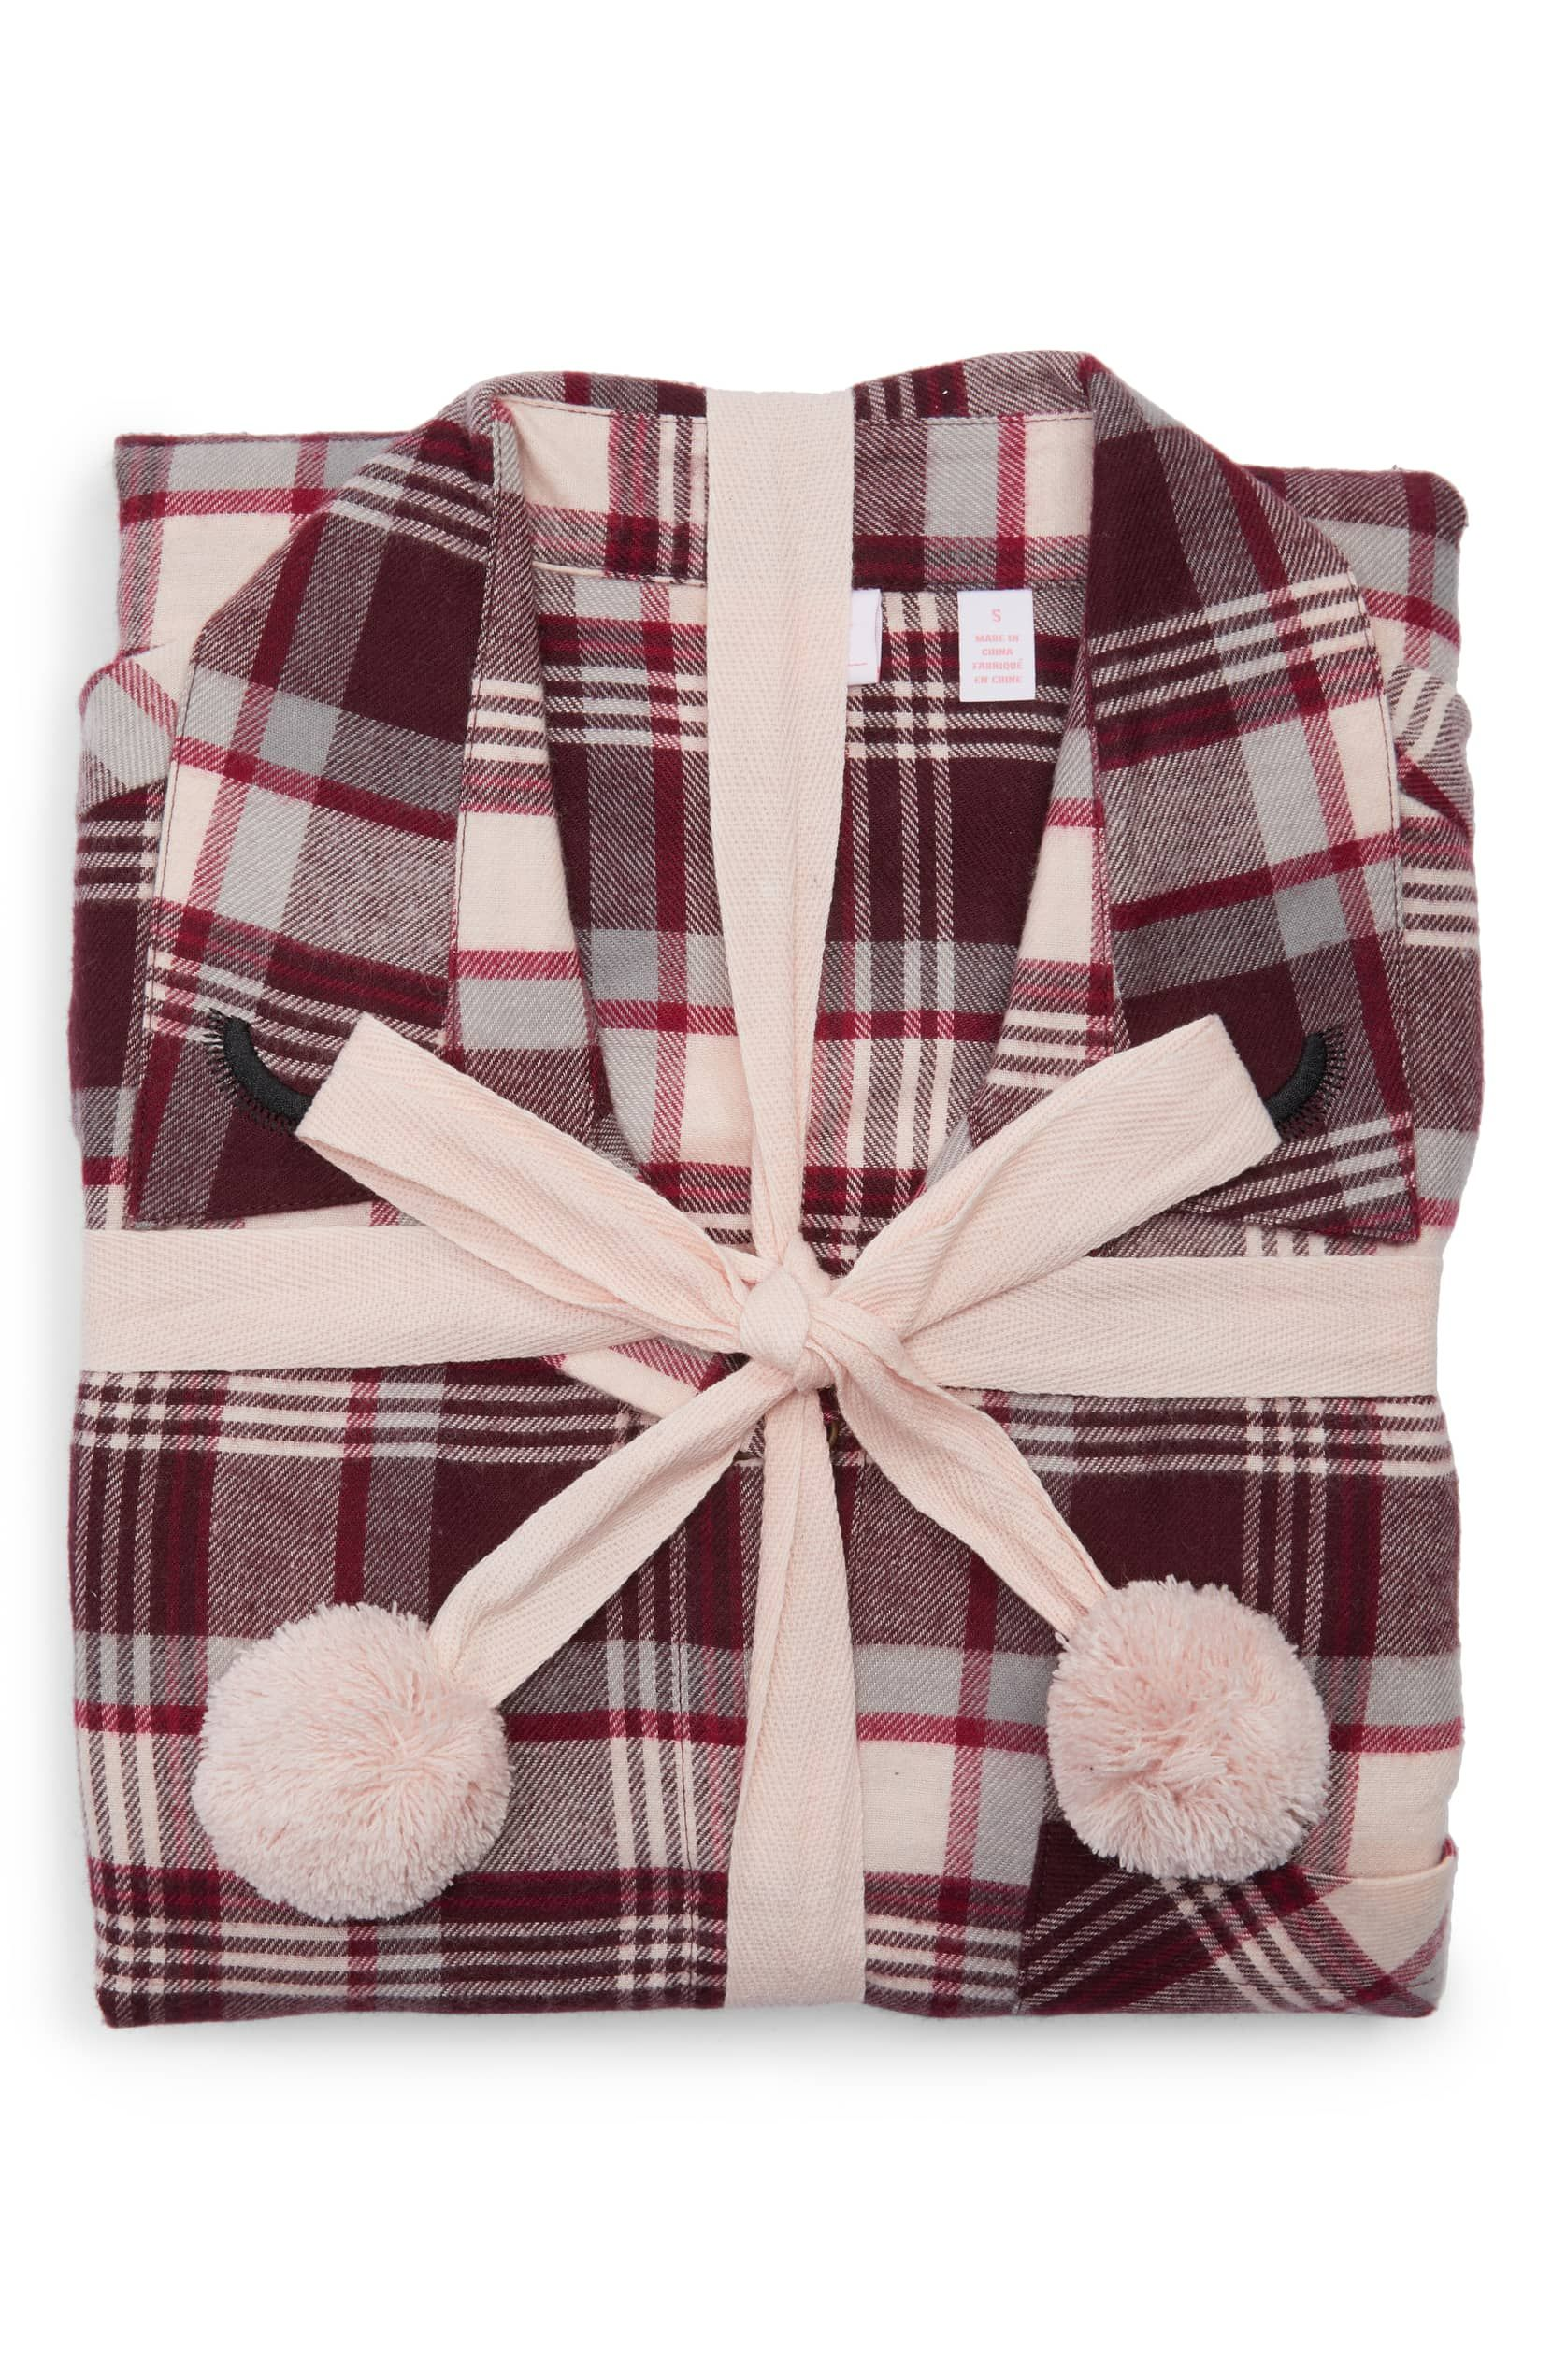 AUDREY Make + Model Flannel Girlfriend Pajamas - Burgundy Berry Lou Plaid dfbb1273e